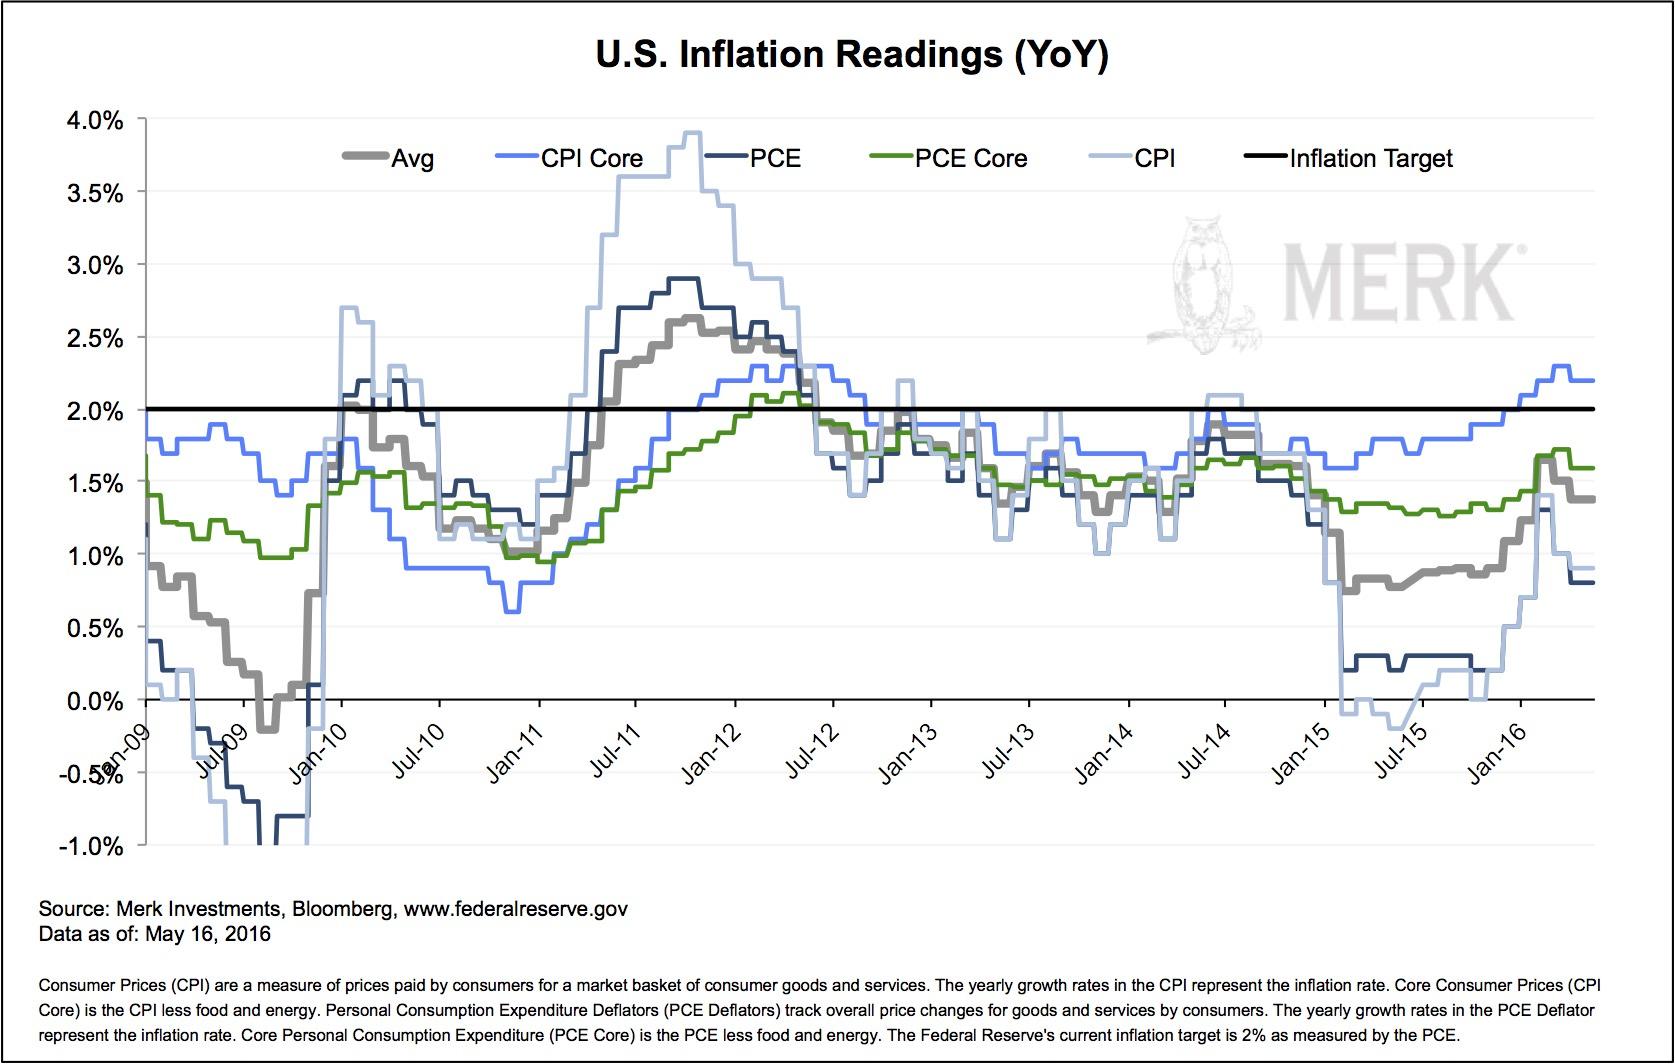 Description: MILLC.Marketing:Insights newsletters and blogs:2016 Merk Insights:2016-05-09 support:2016-05-16-inflation.jpg